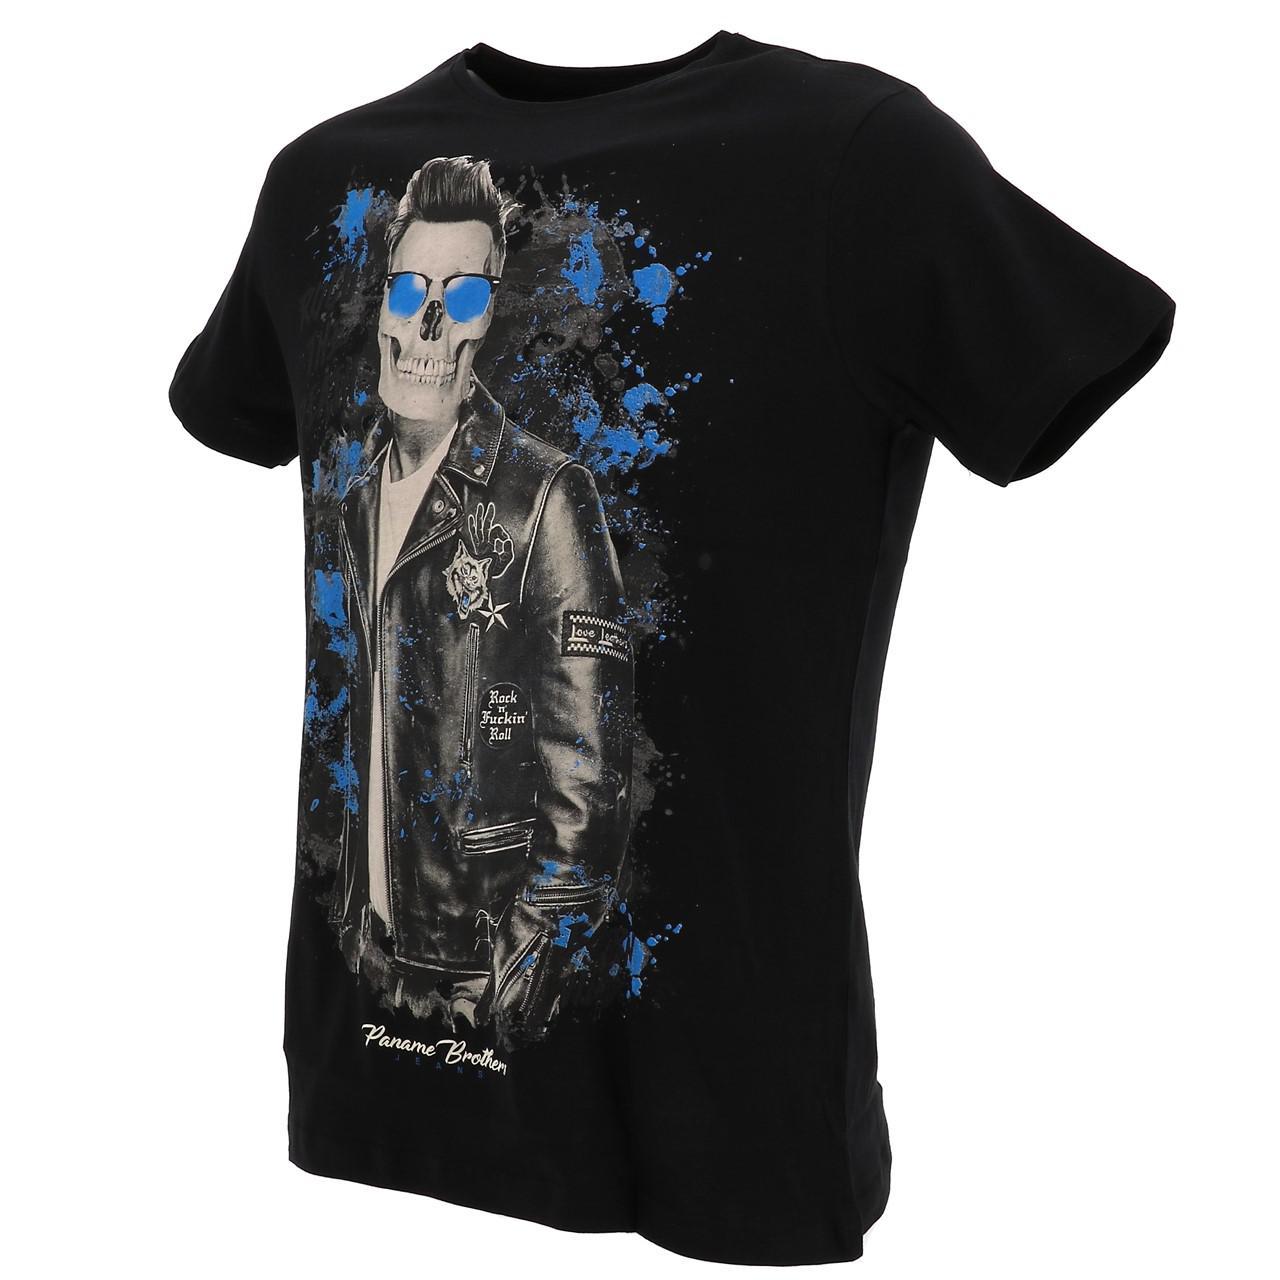 Short-Sleeve-T-Shirt-Paname-Brothers-Merico-Black-Mc-Tee-Black-26749-New thumbnail 4